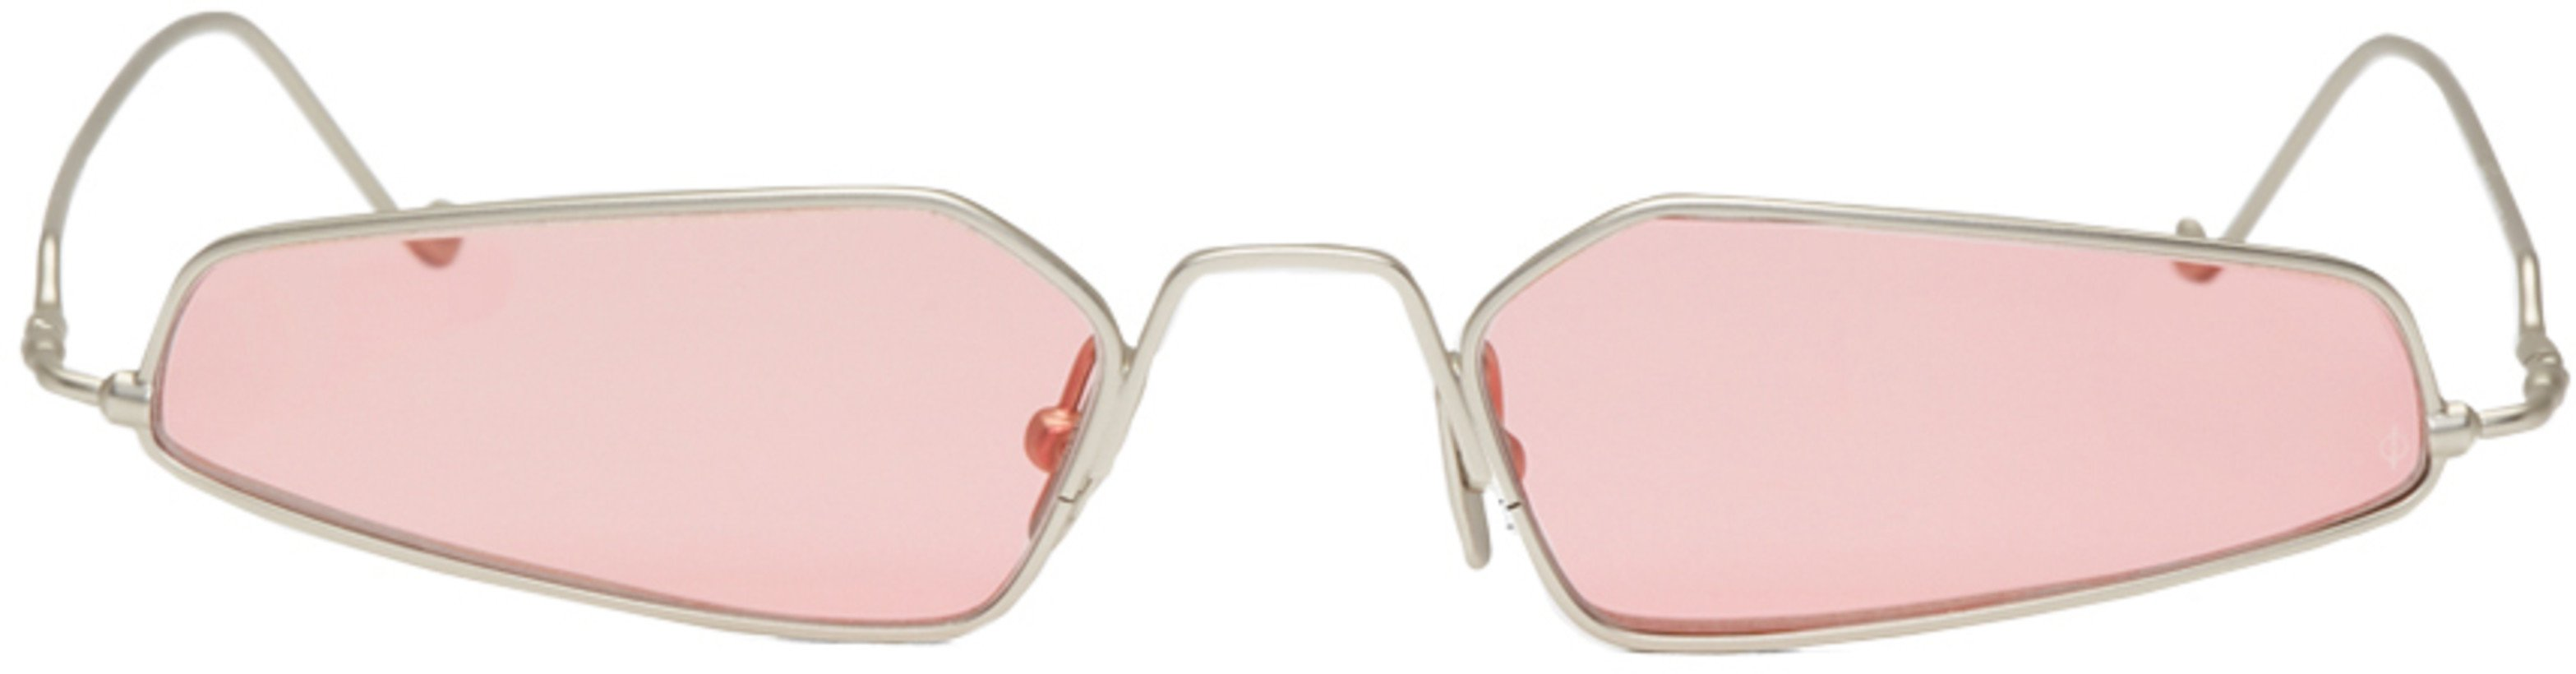 NOR  Silver & Pink Dimensions Micro Sunglasses €195 EUR